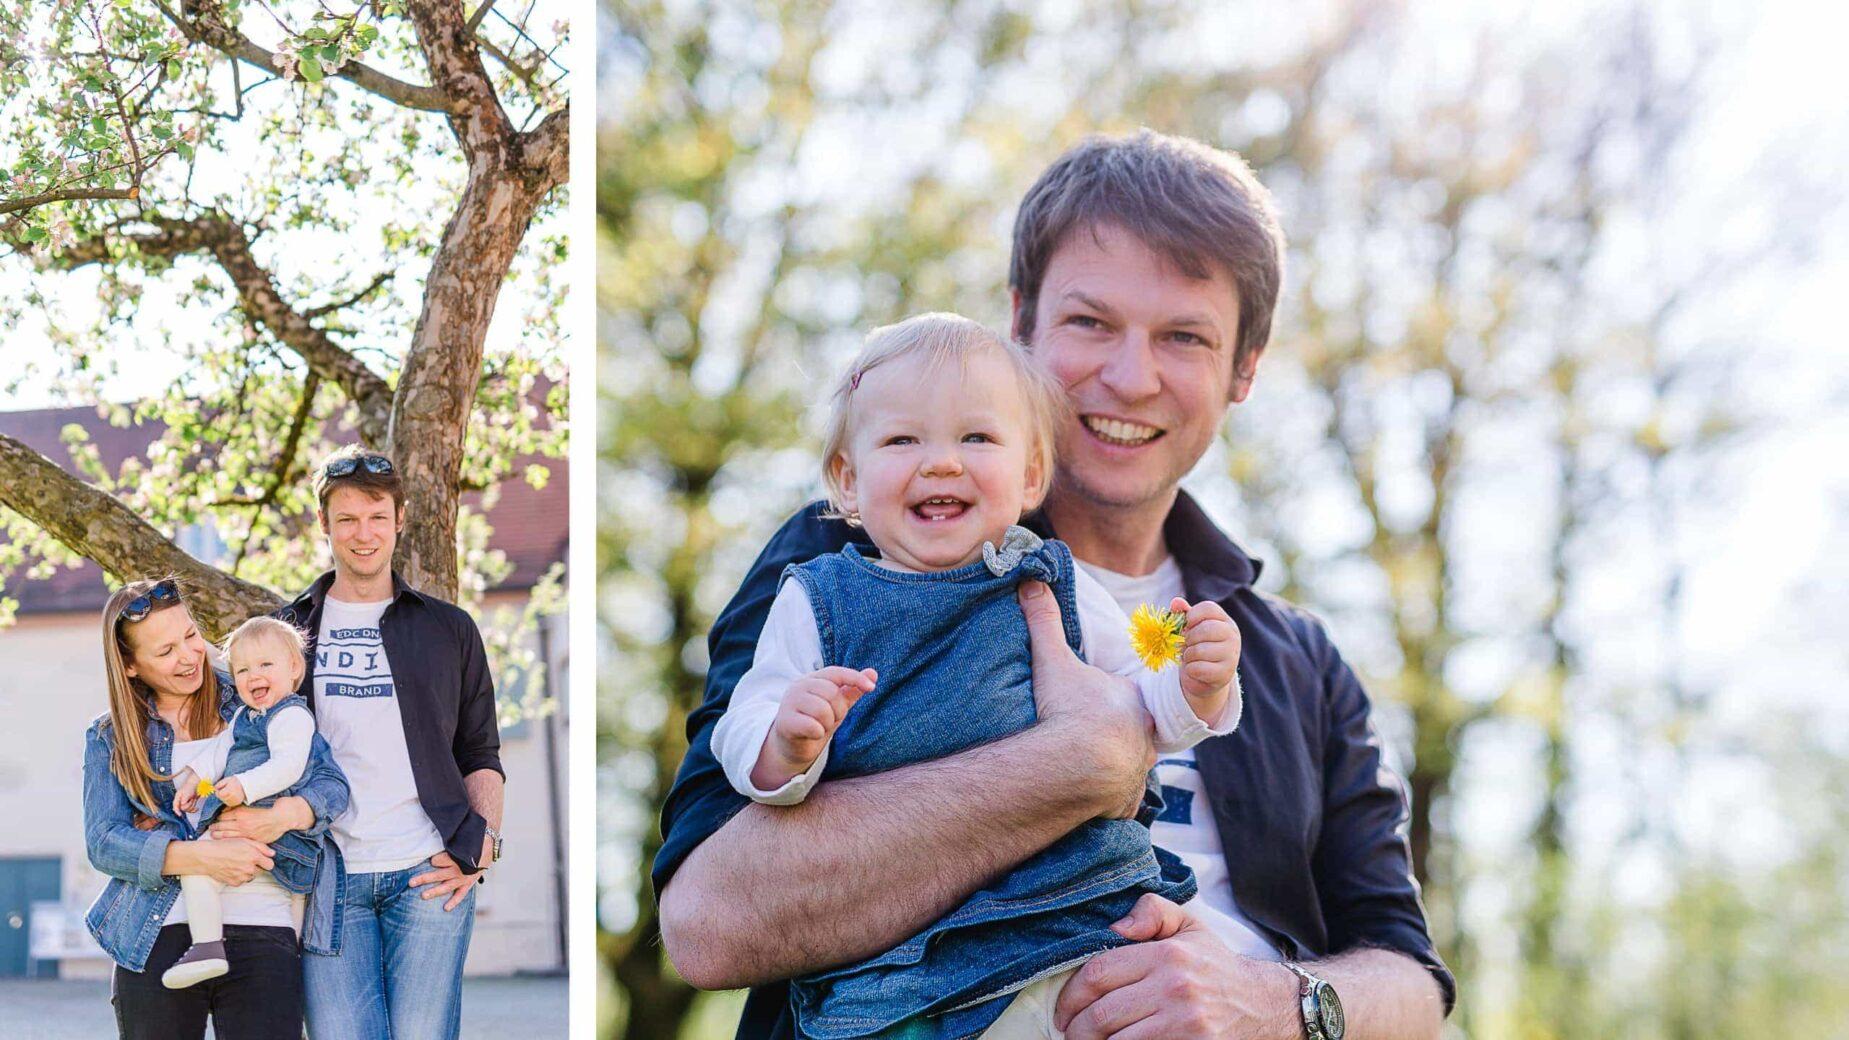 Familienfotos in München, Familyshoot, Kinderfotografie